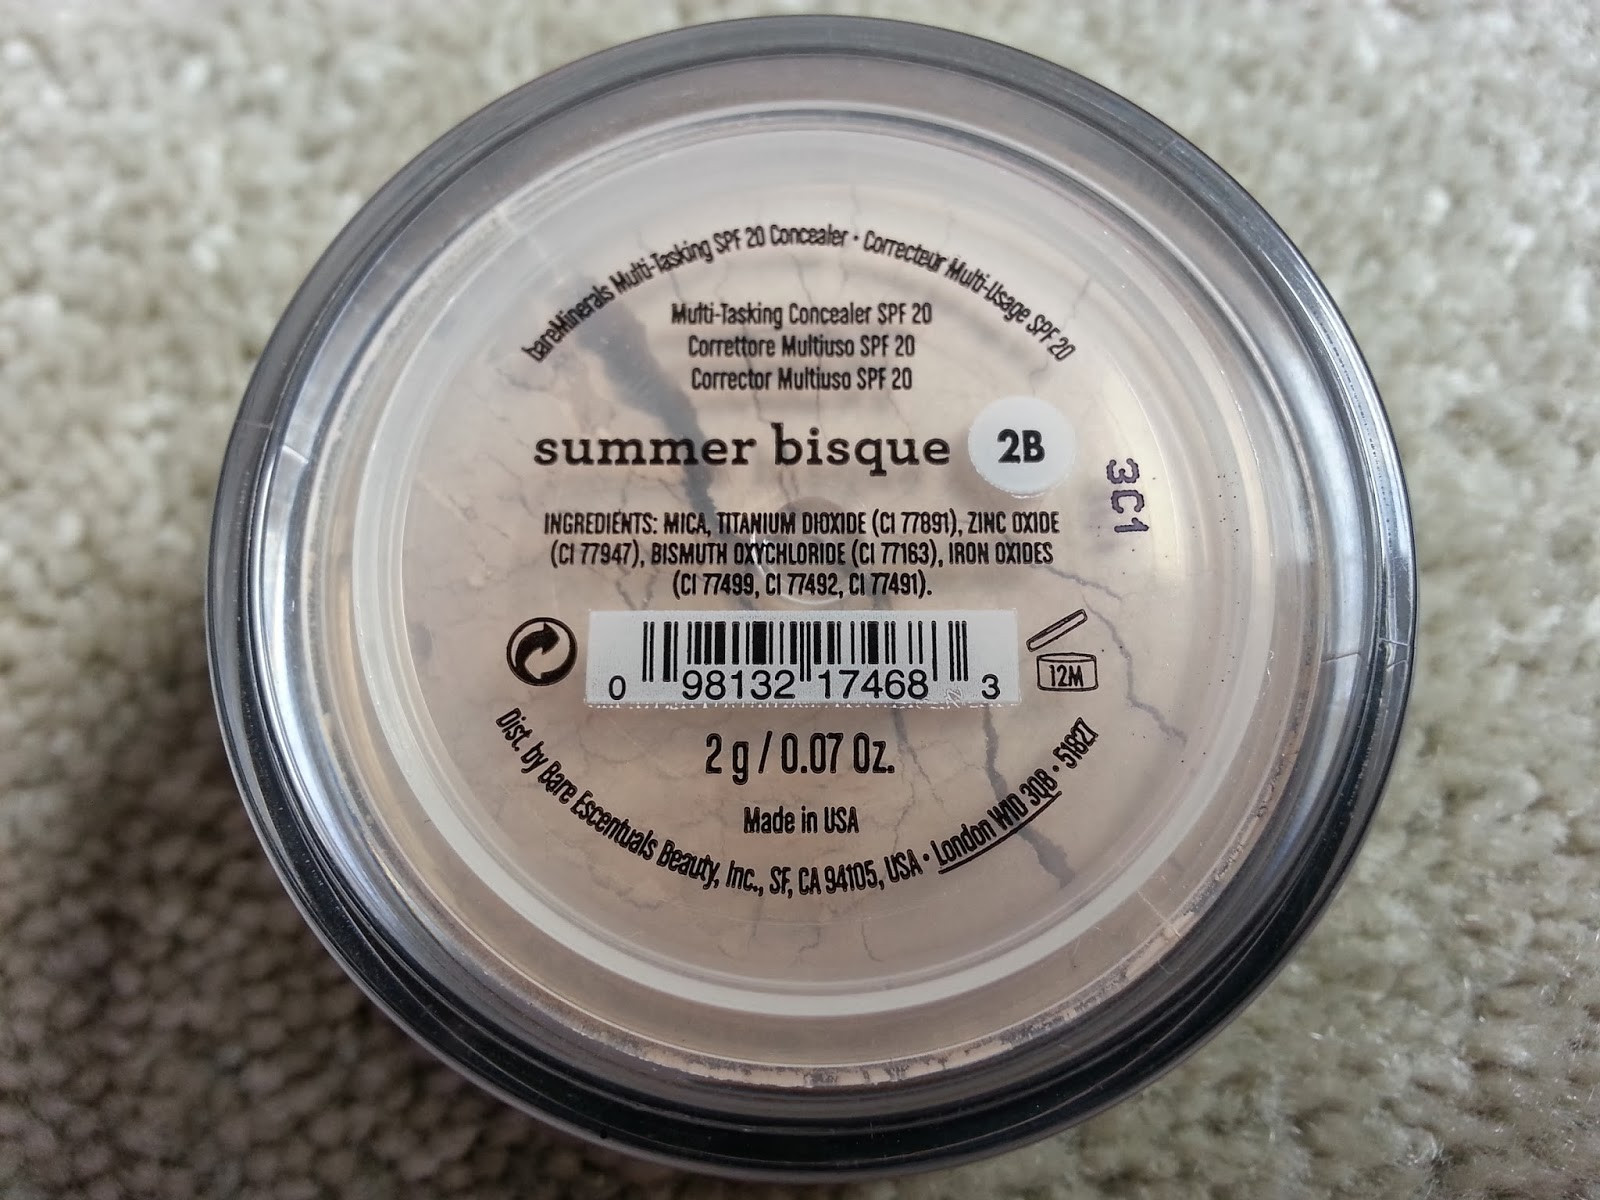 Bare Minerals Summer Bisque  Beauty Makeup Etc bareminerals concealer